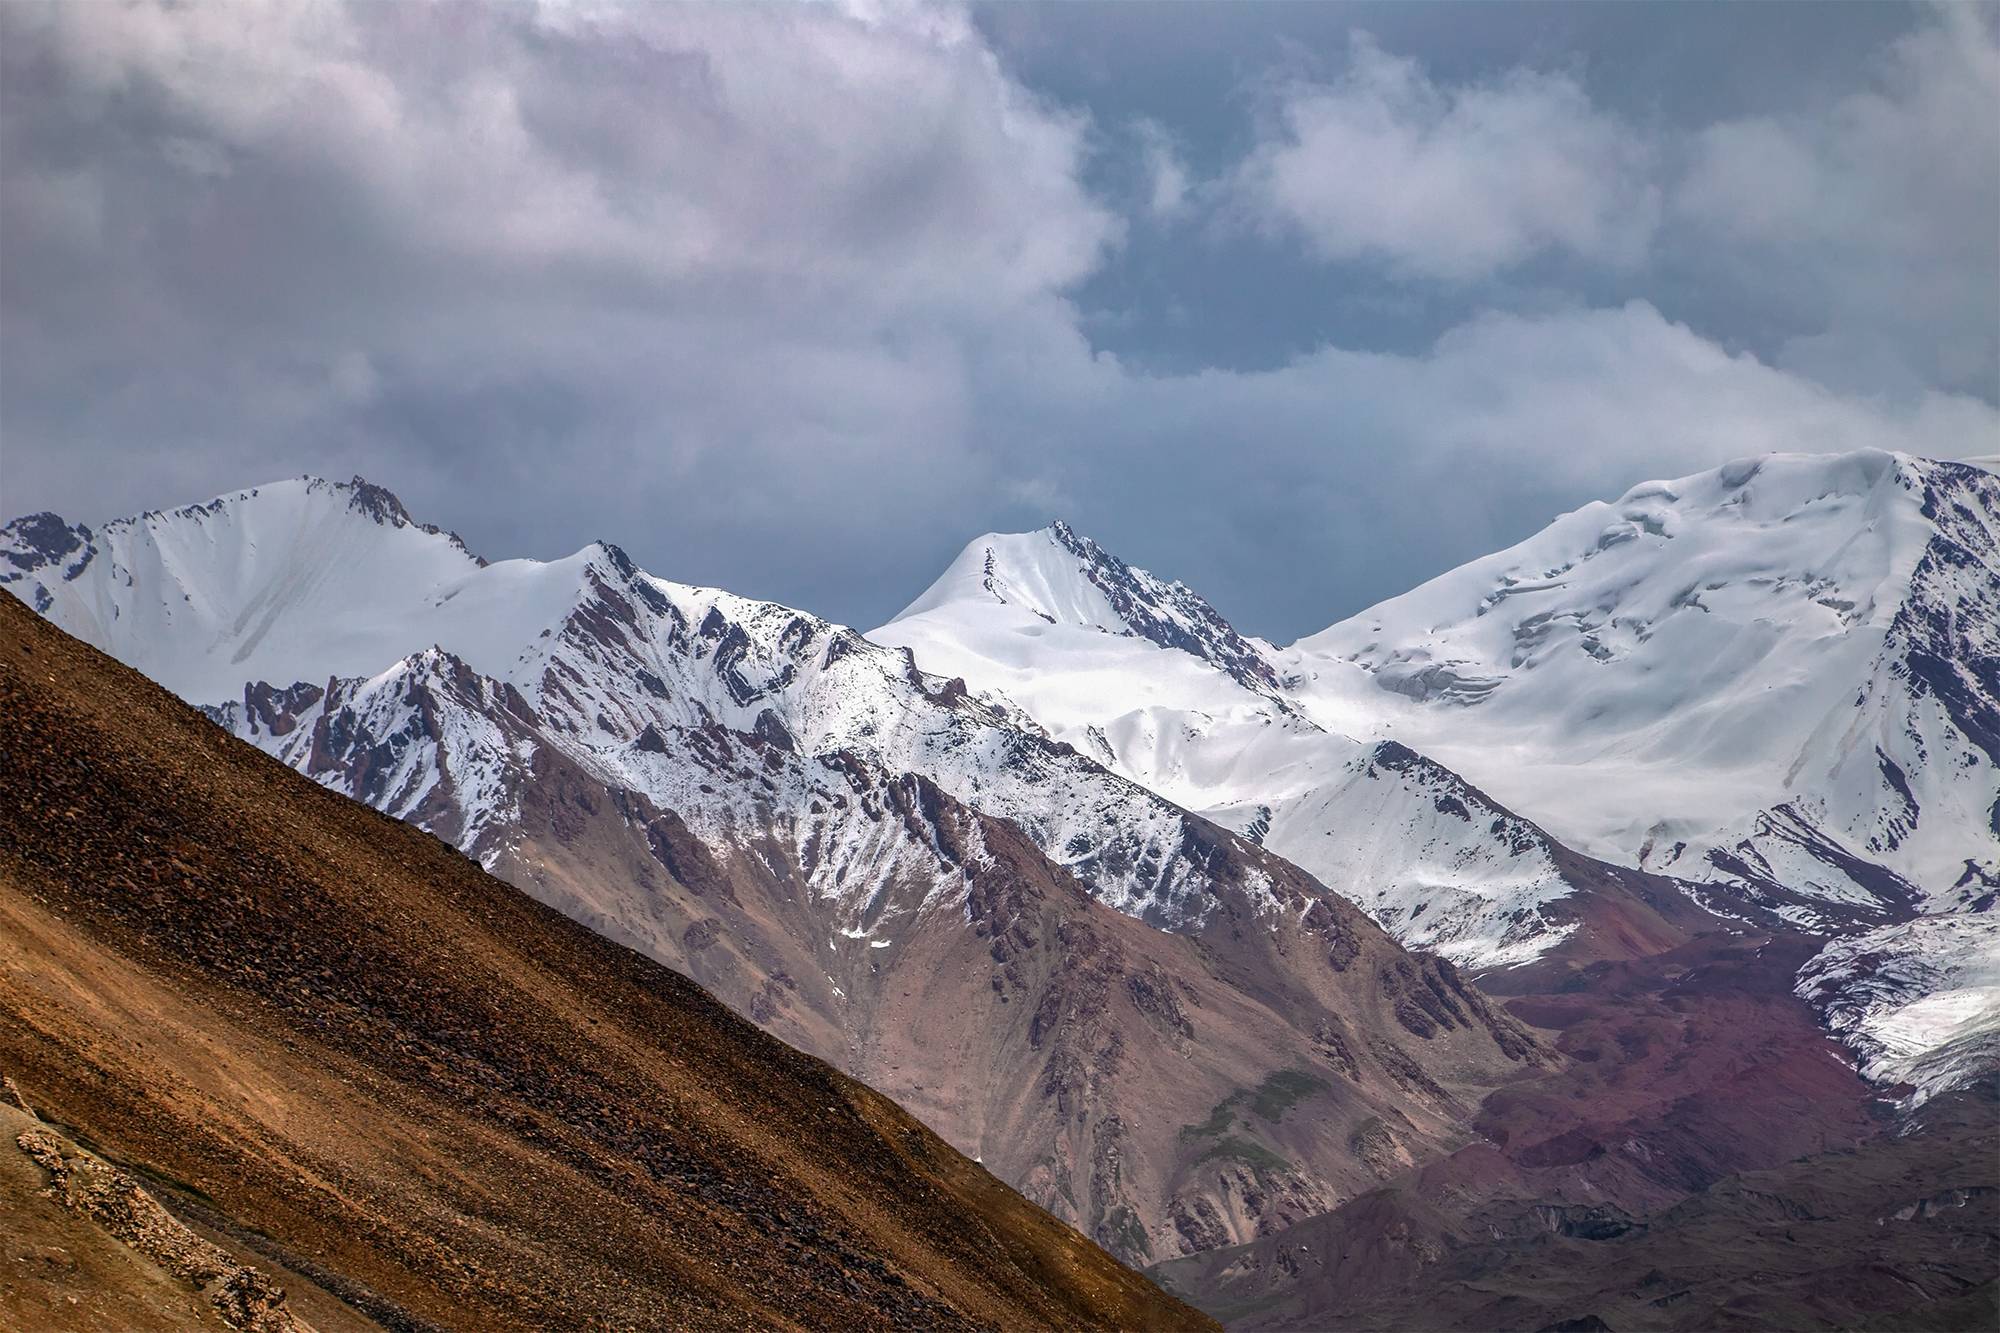 кыргызстан, горы, памиро-алай, Магалимова Элина